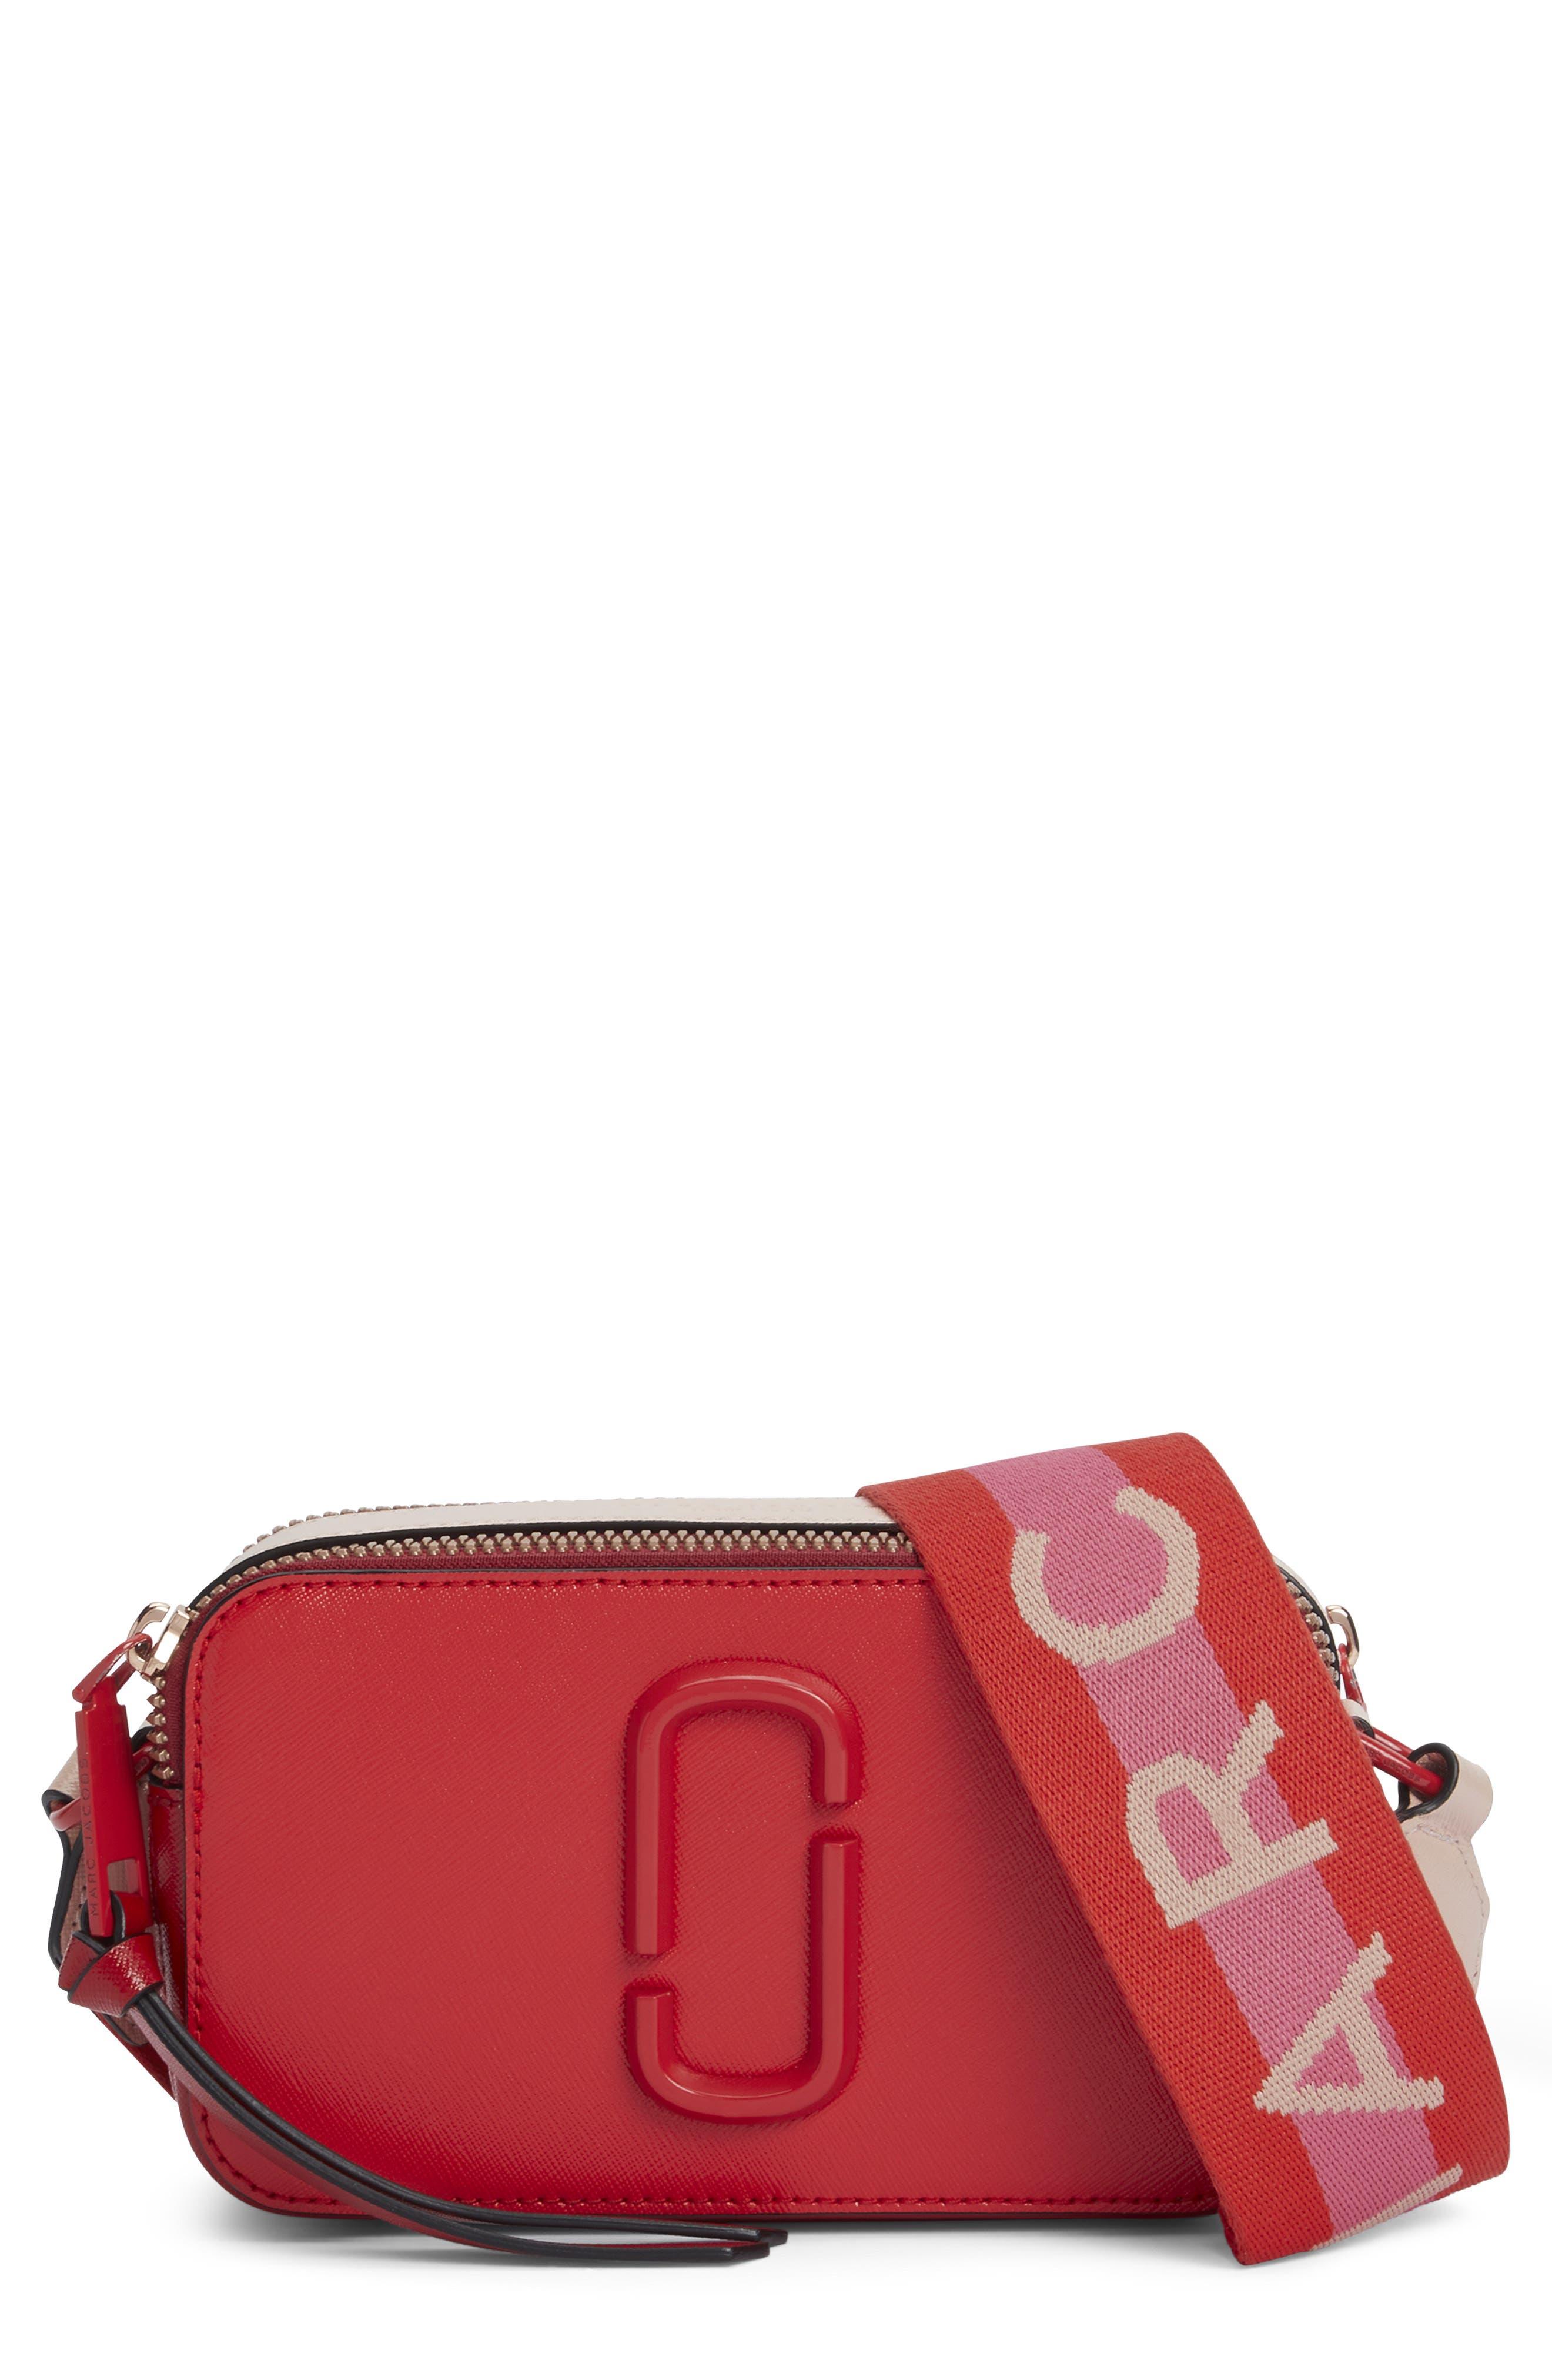 Snapshot Leather Crossbody Bag - Red in Poppy Red Multi